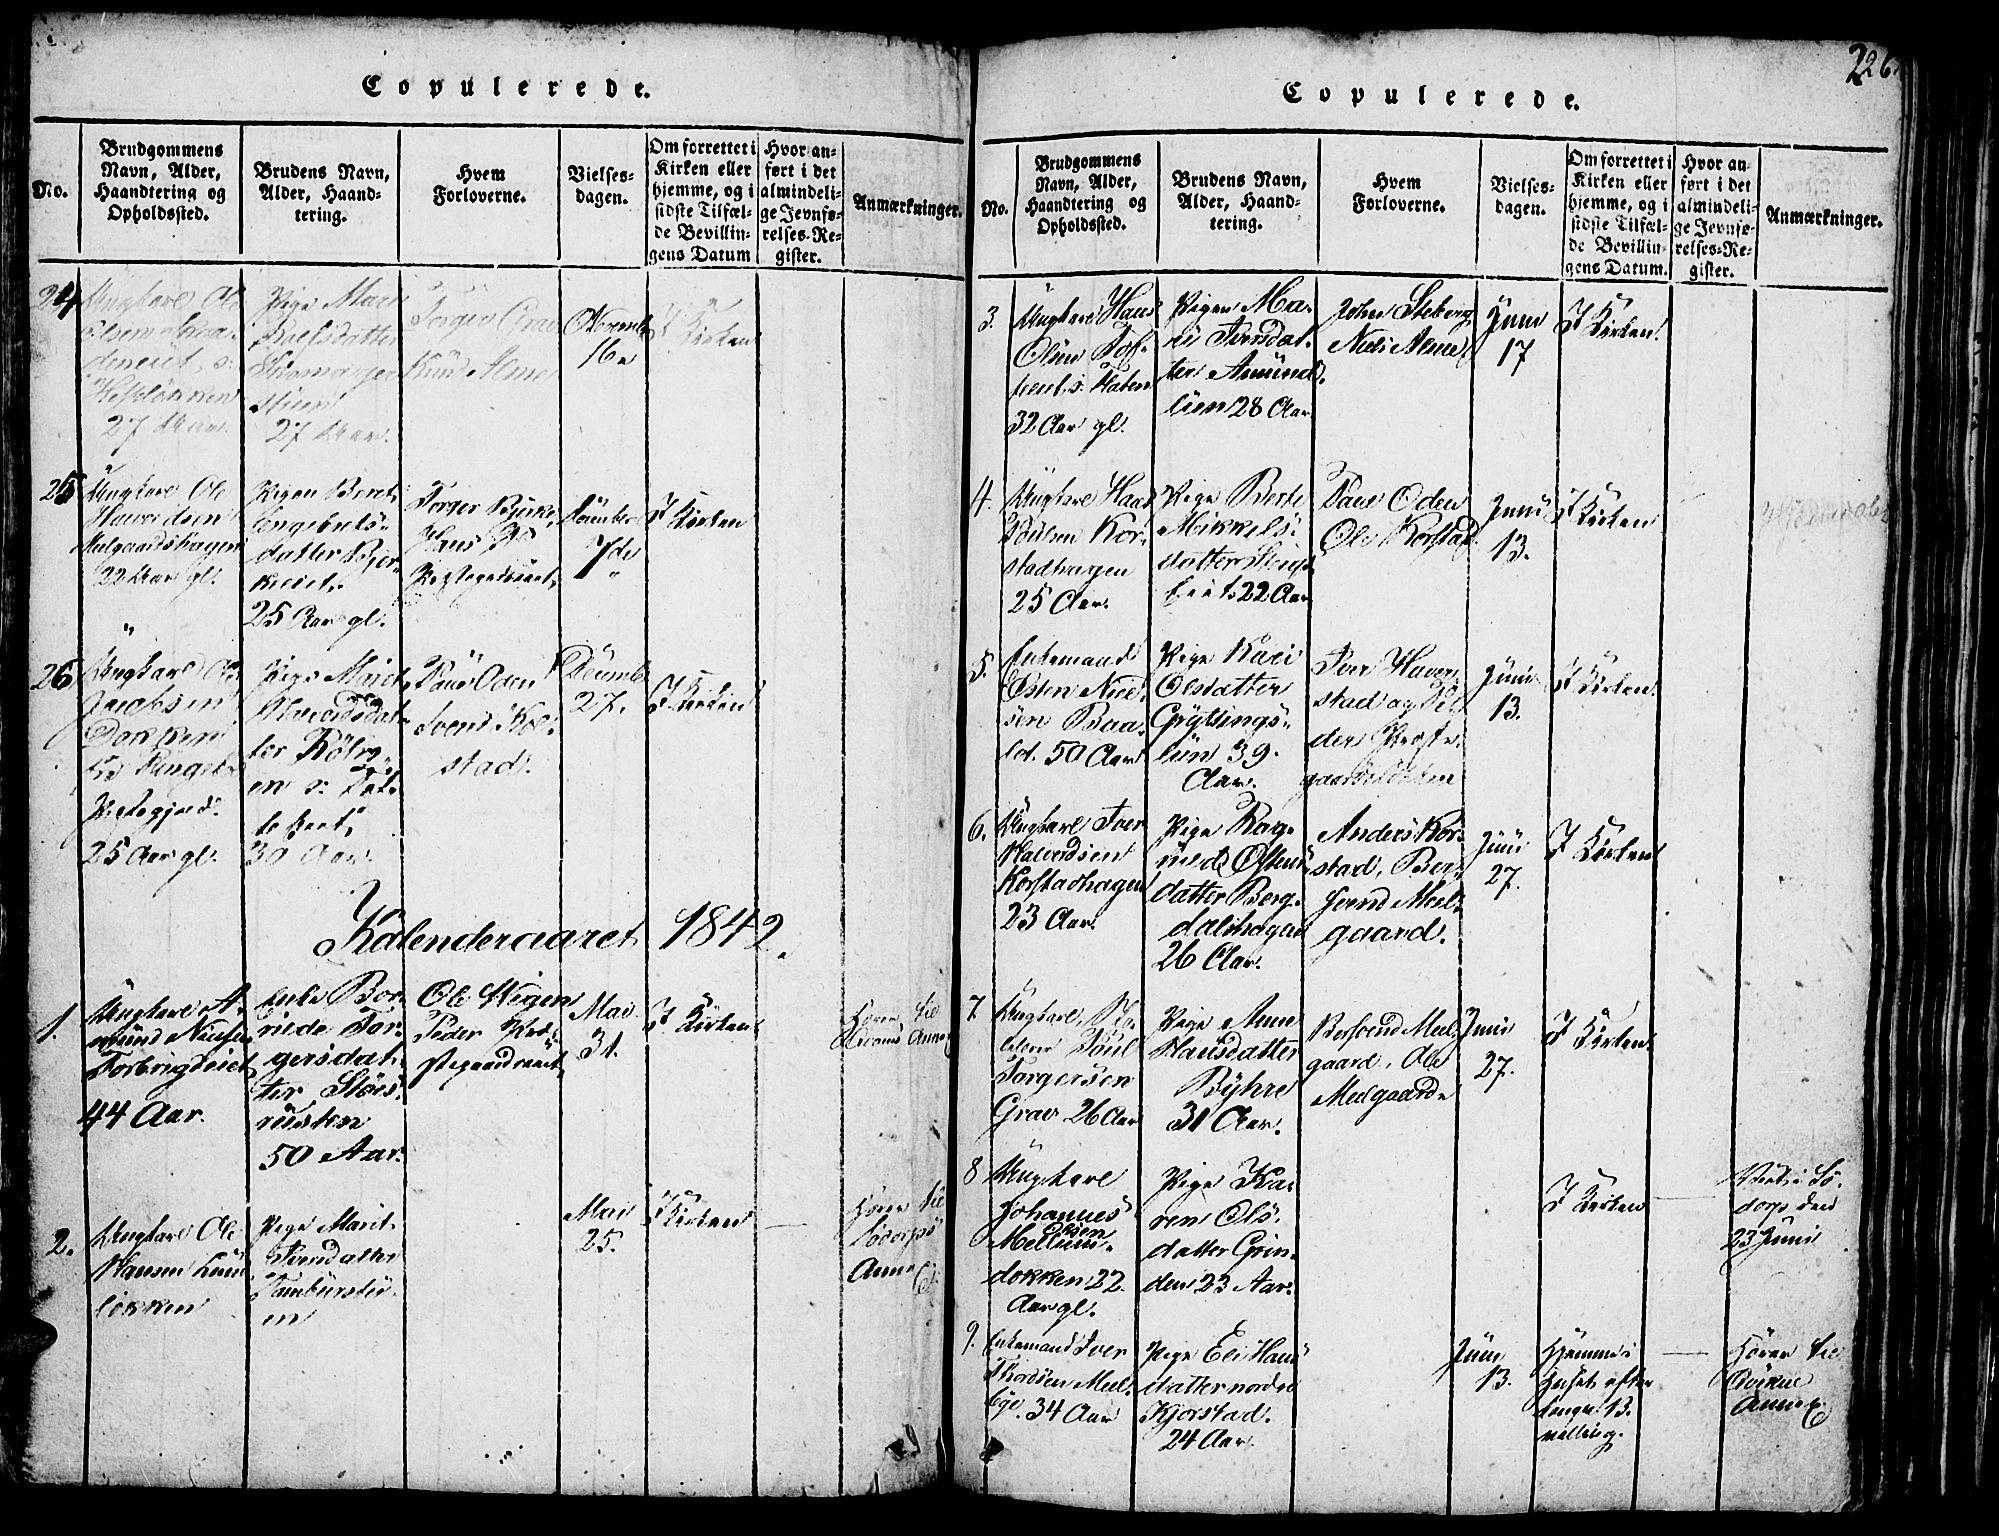 SAH, Fron prestekontor, H/Ha/Hab/L0001: Klokkerbok nr. 1, 1816-1843, s. 226